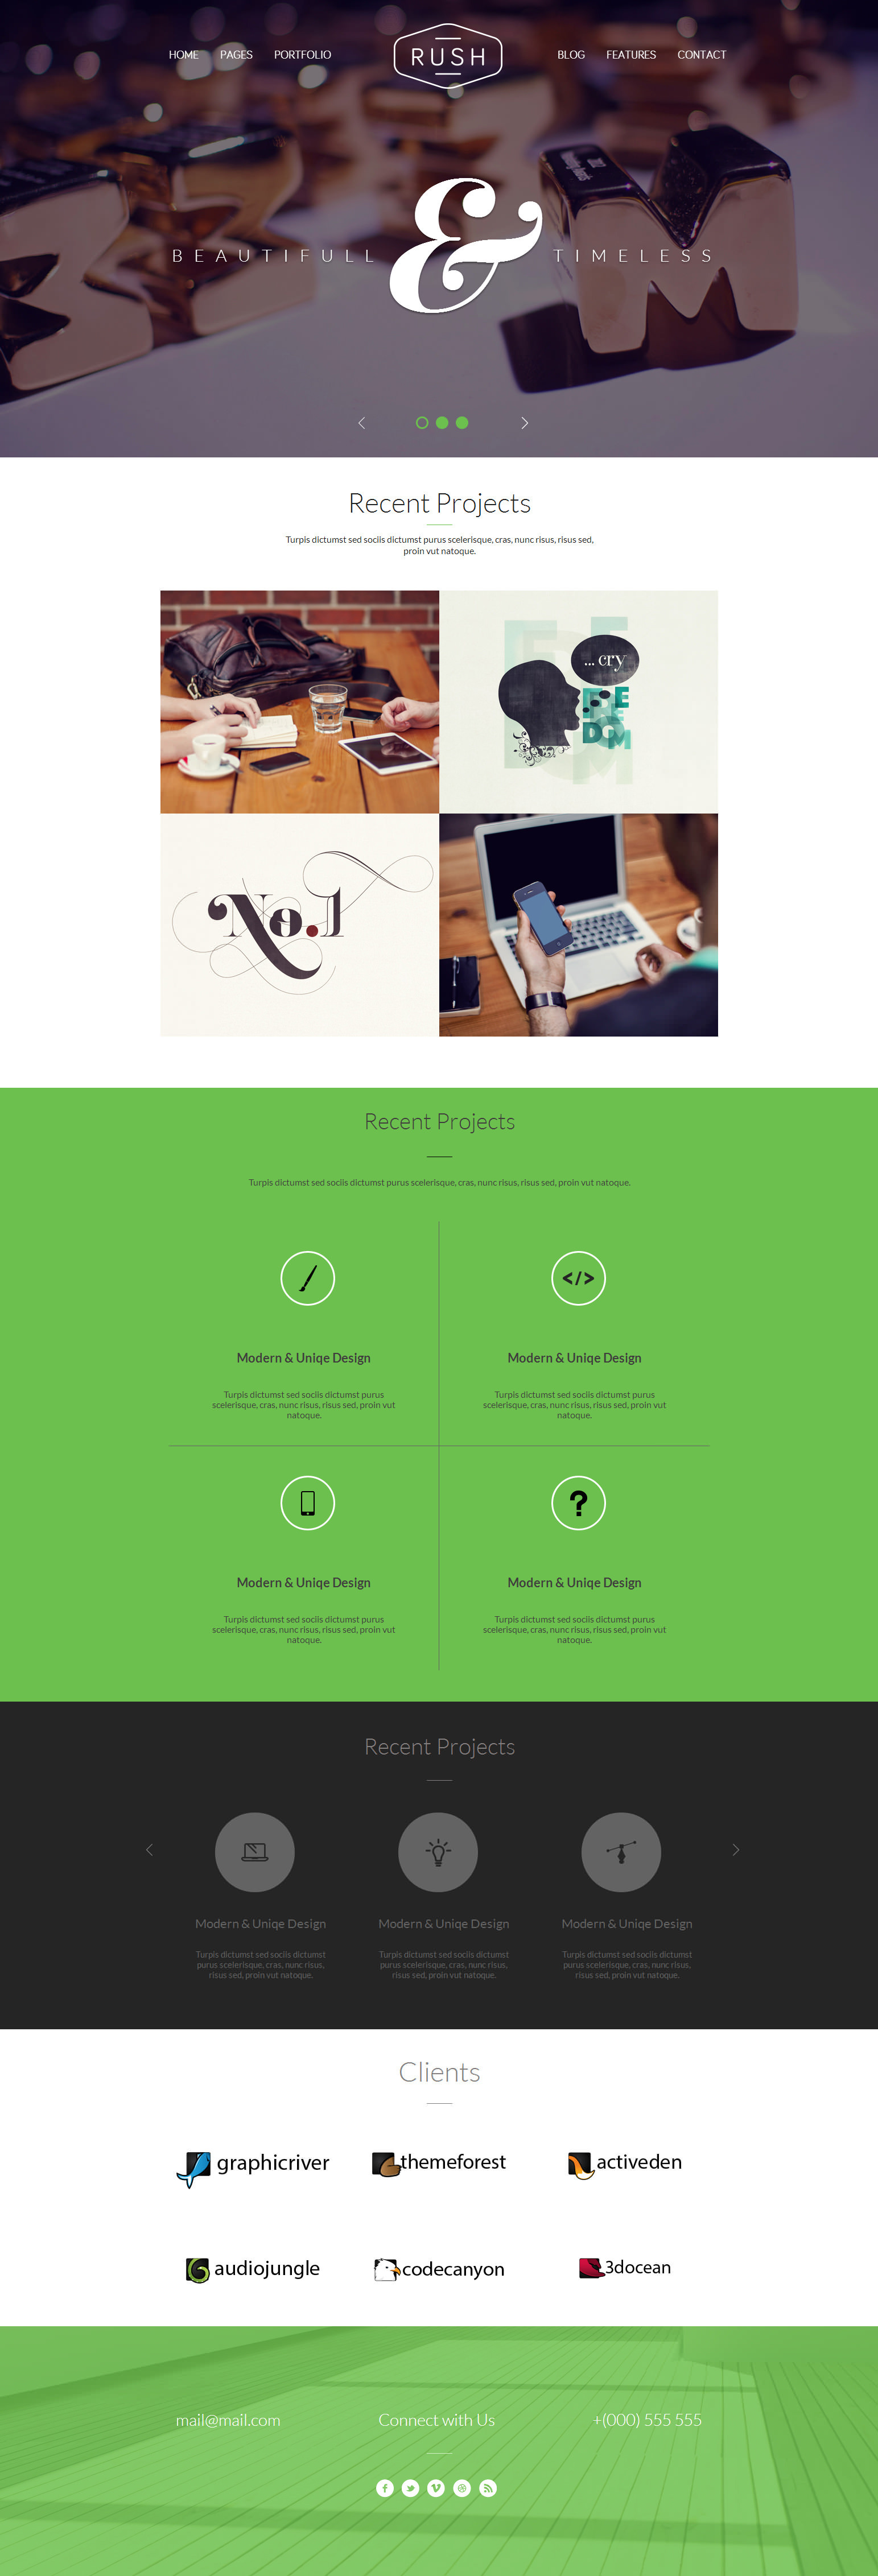 Rush - Multipurpose Creative Responsive Website